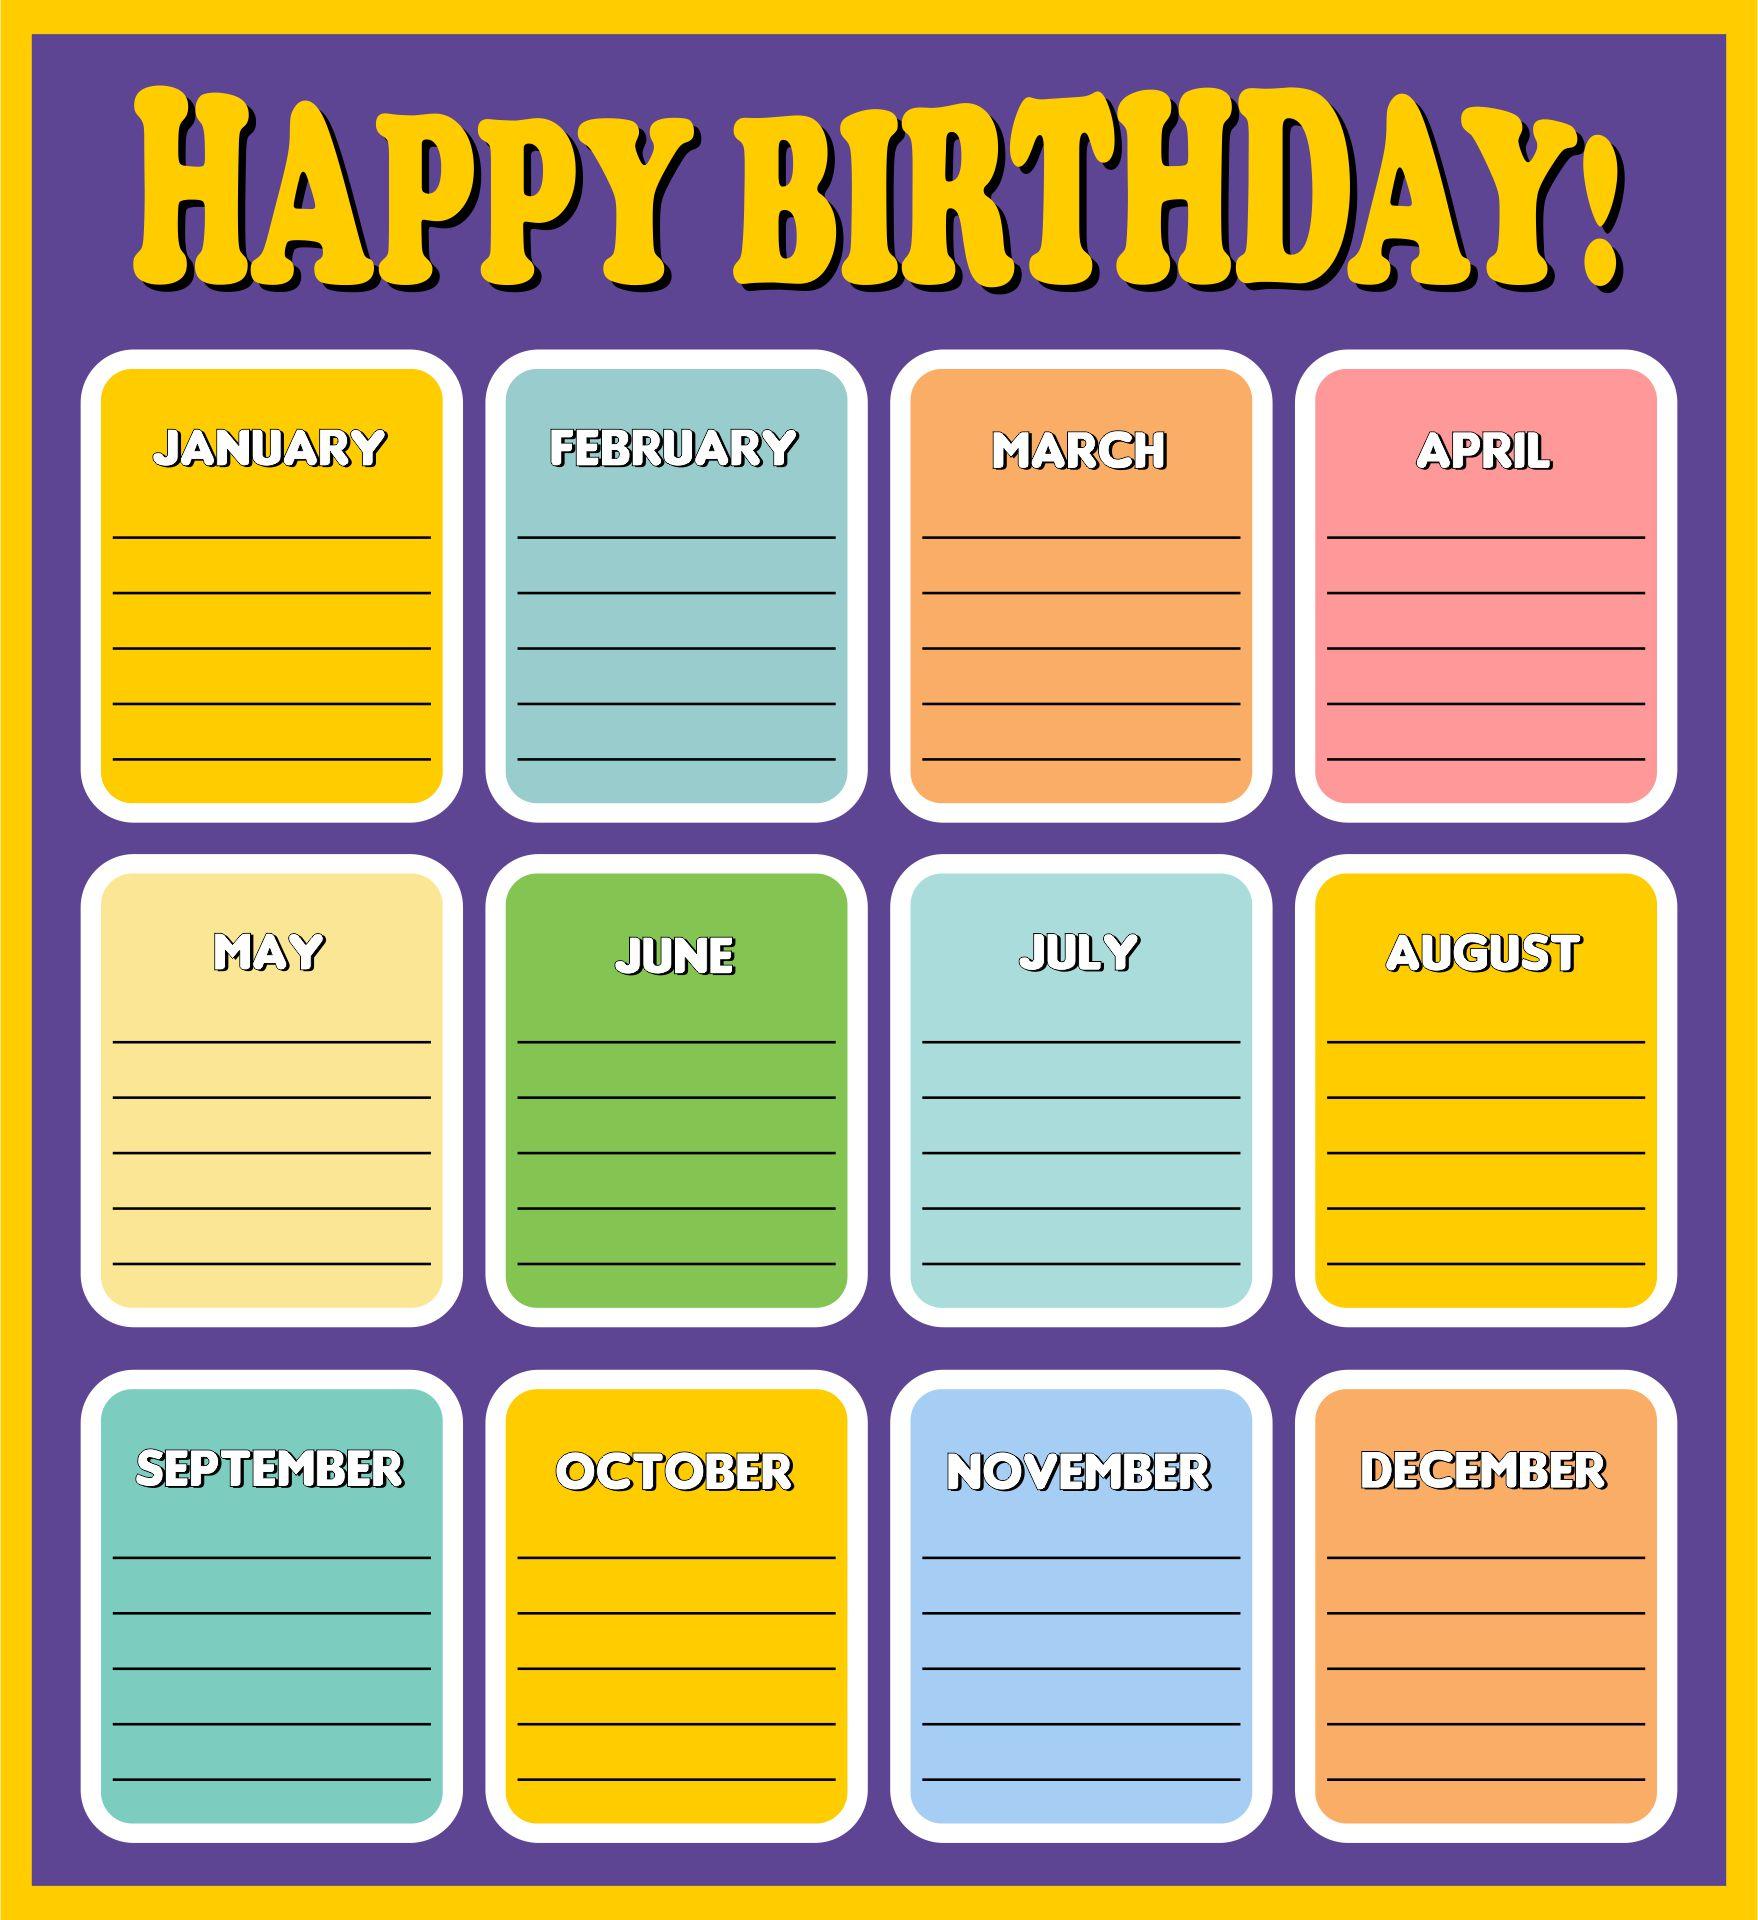 Classroom Birthday Chart for Preschool